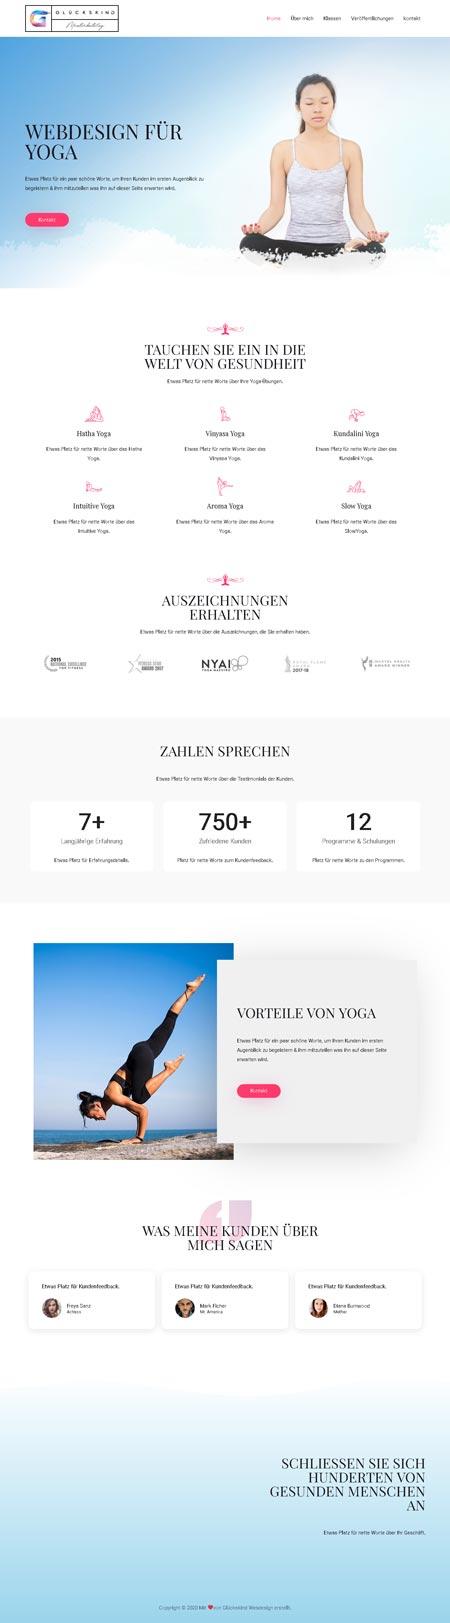 Yoga Devi - Glückskind Webdesign Musterkatalog